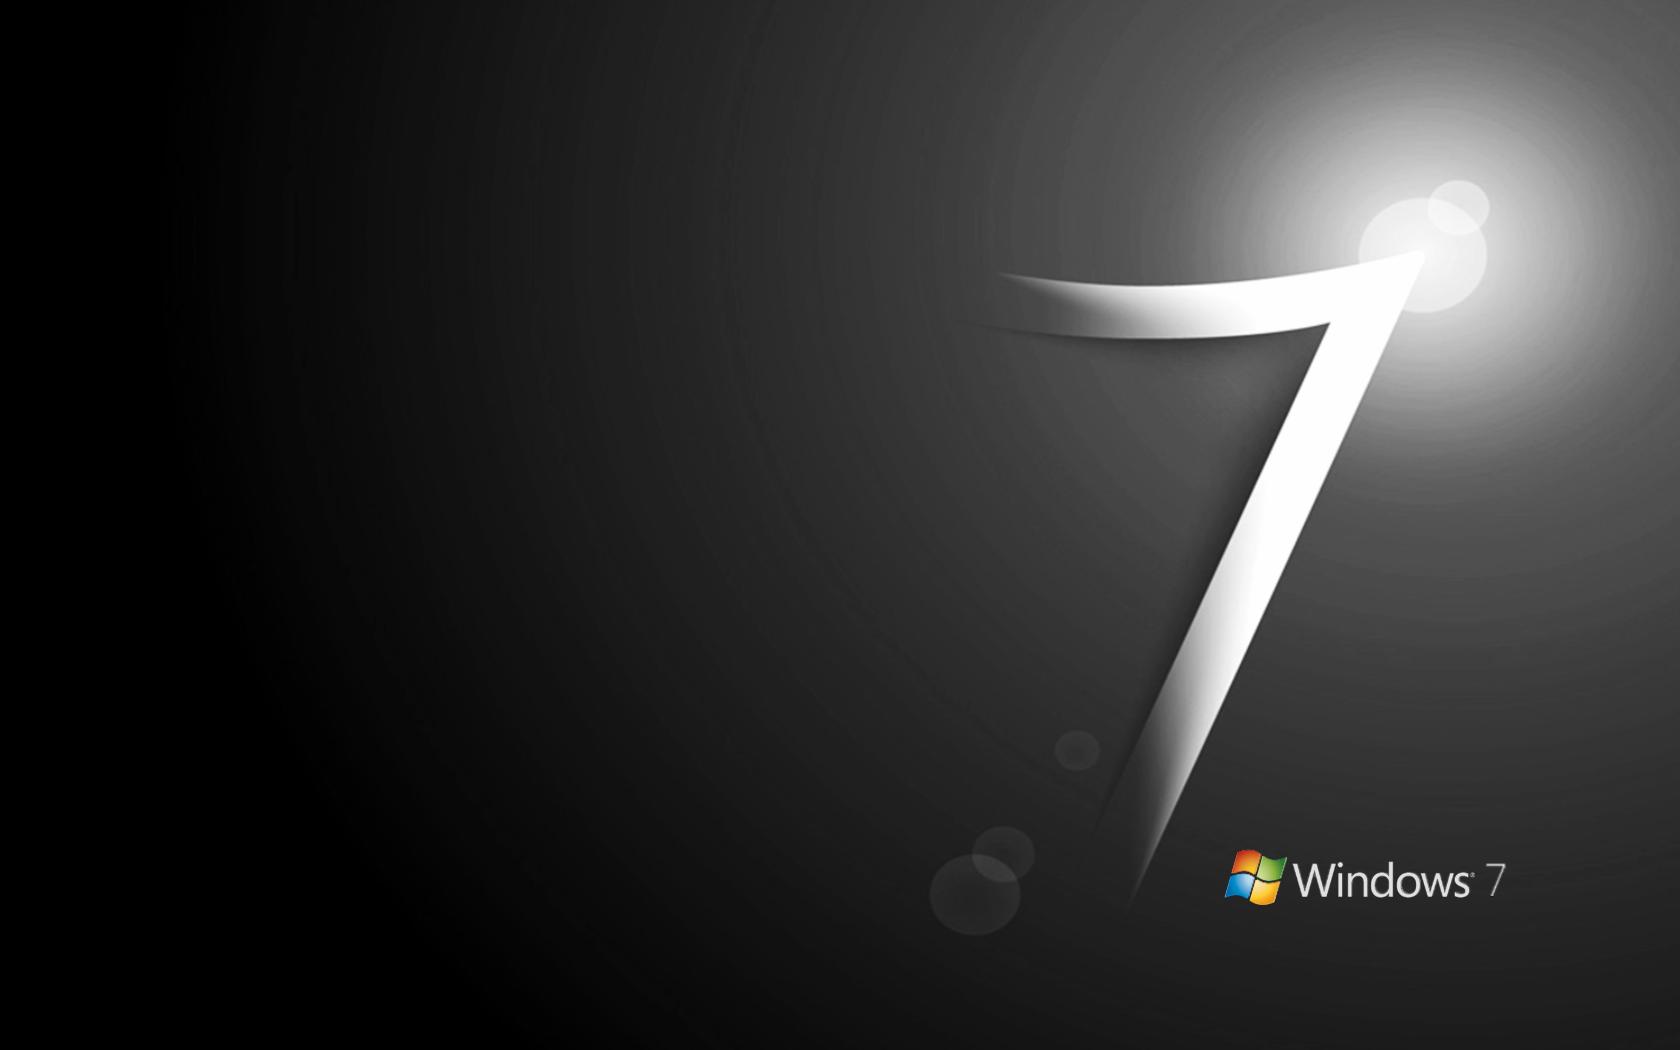 windows 7 black wlogo « awesome wallpapers